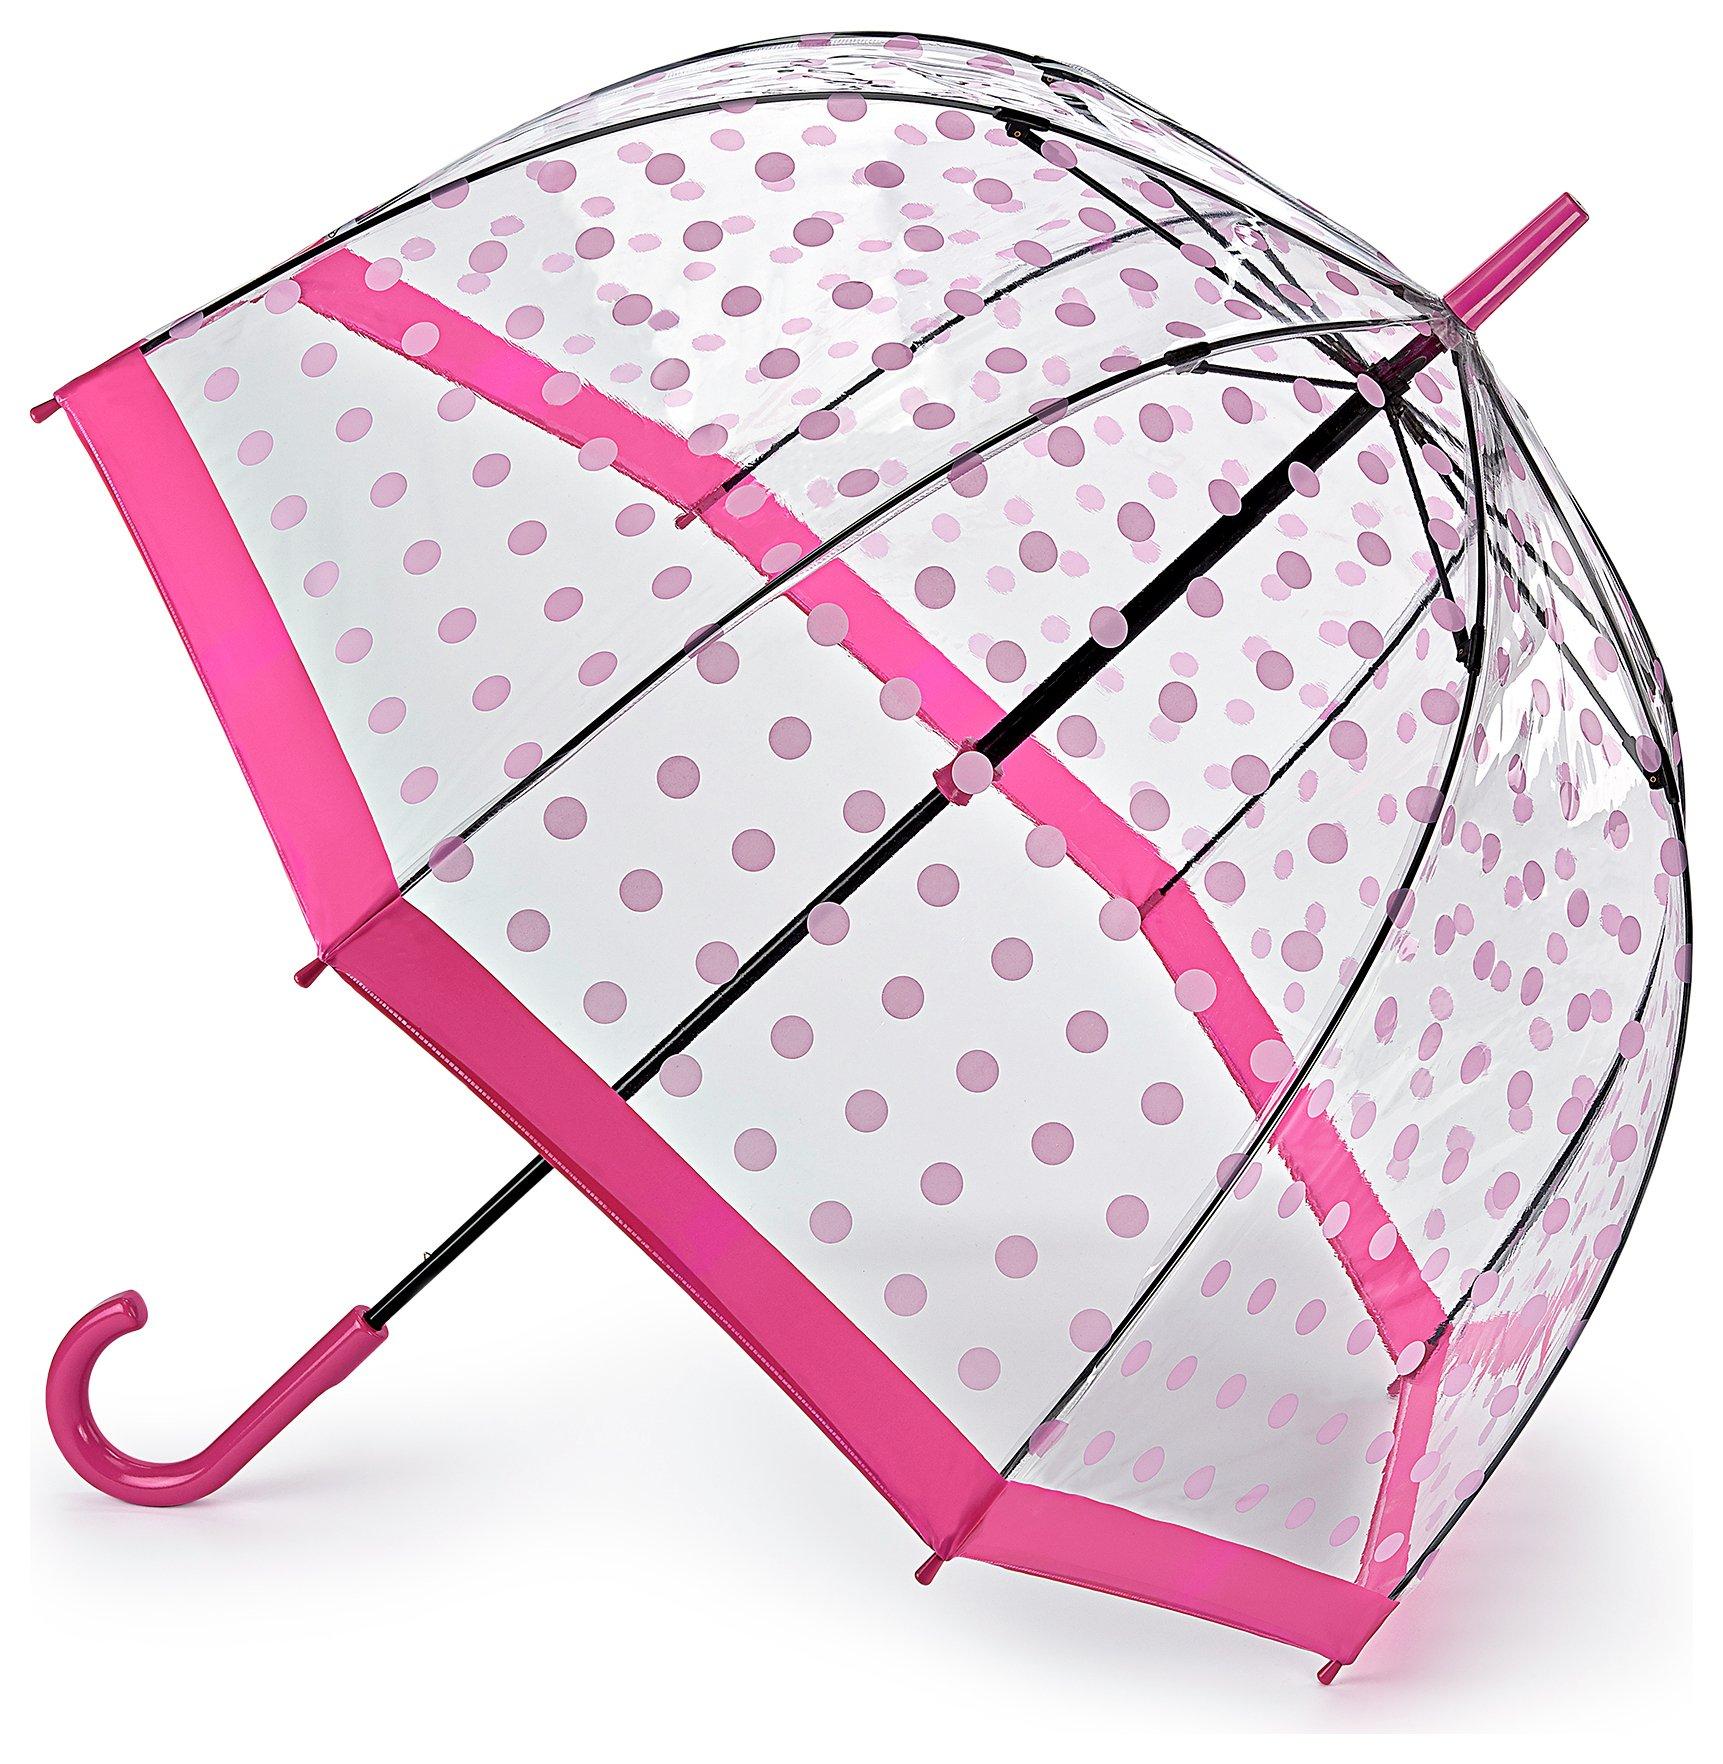 Fulton Birdcage 2 Umbrella - Pink Polka Umbrella